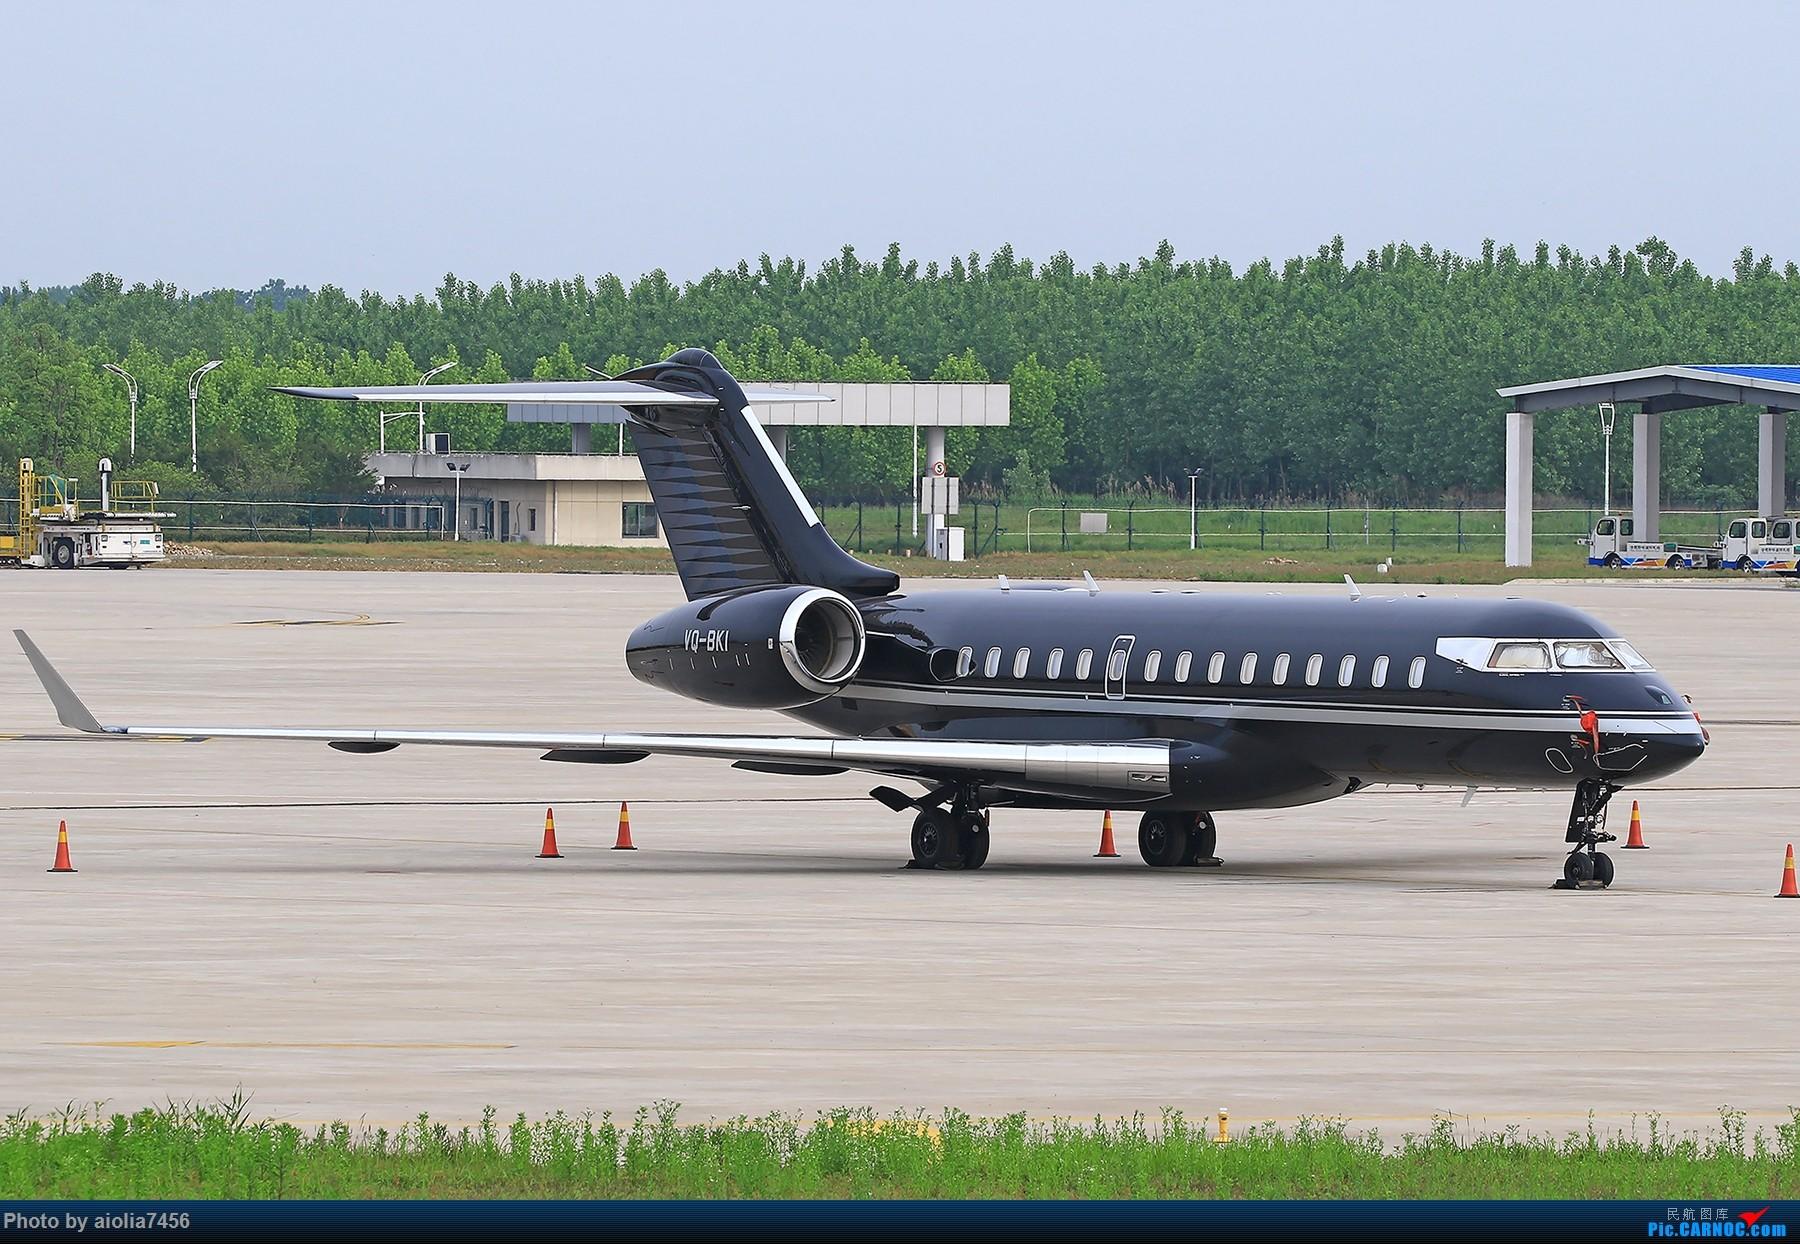 Re:[原创][合肥飞友会]霸都打鸡 找个机会白天打华航 顺便看看期待已久的迪斯尼 BOMBARDIER BD-700-1A10 VQ-BKI 中国合肥新桥国际机场